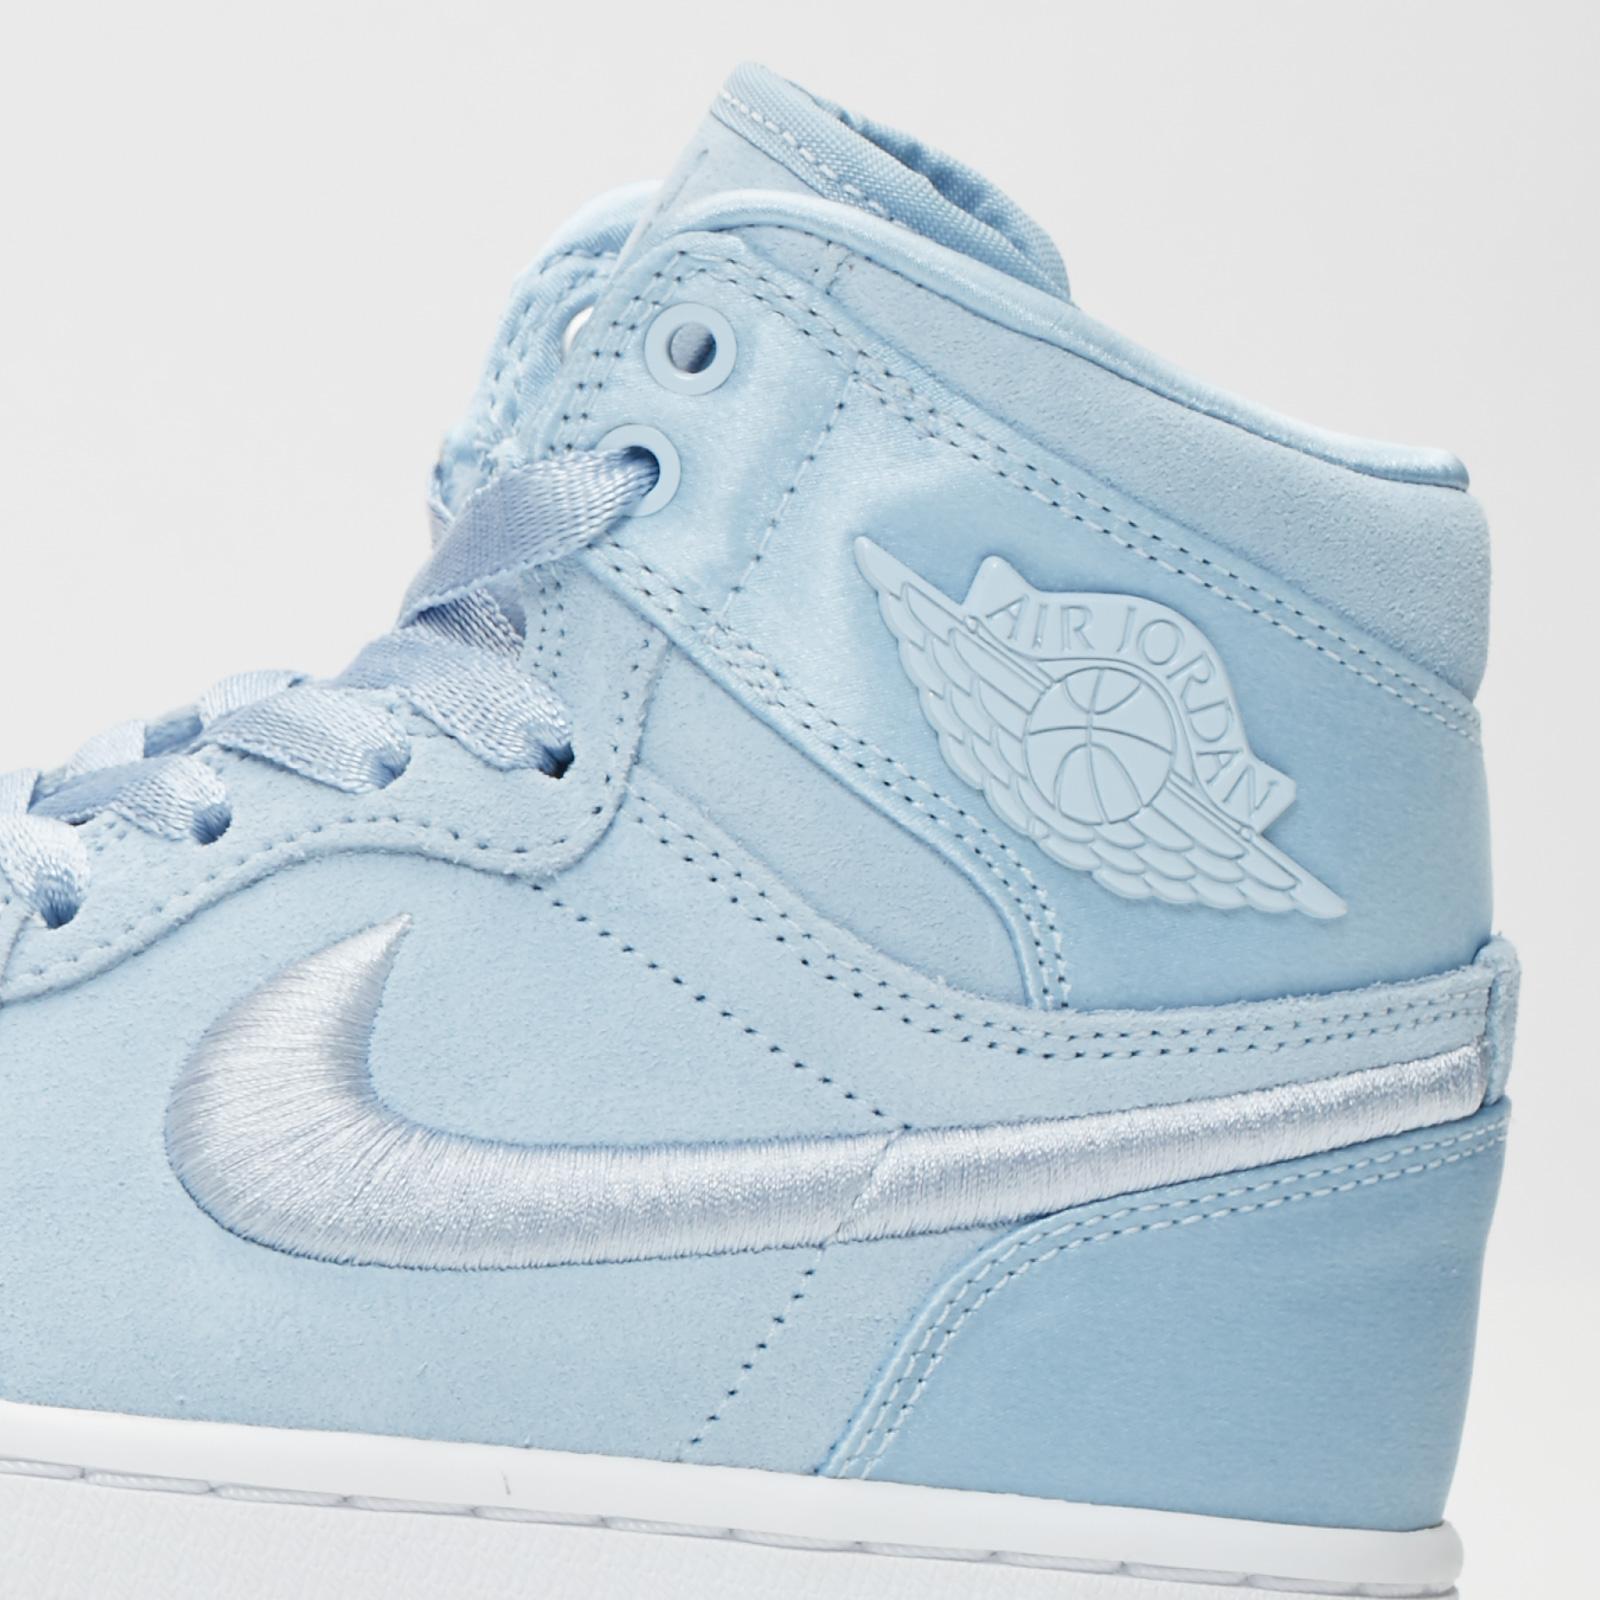 air jordan 1 bleu pastel